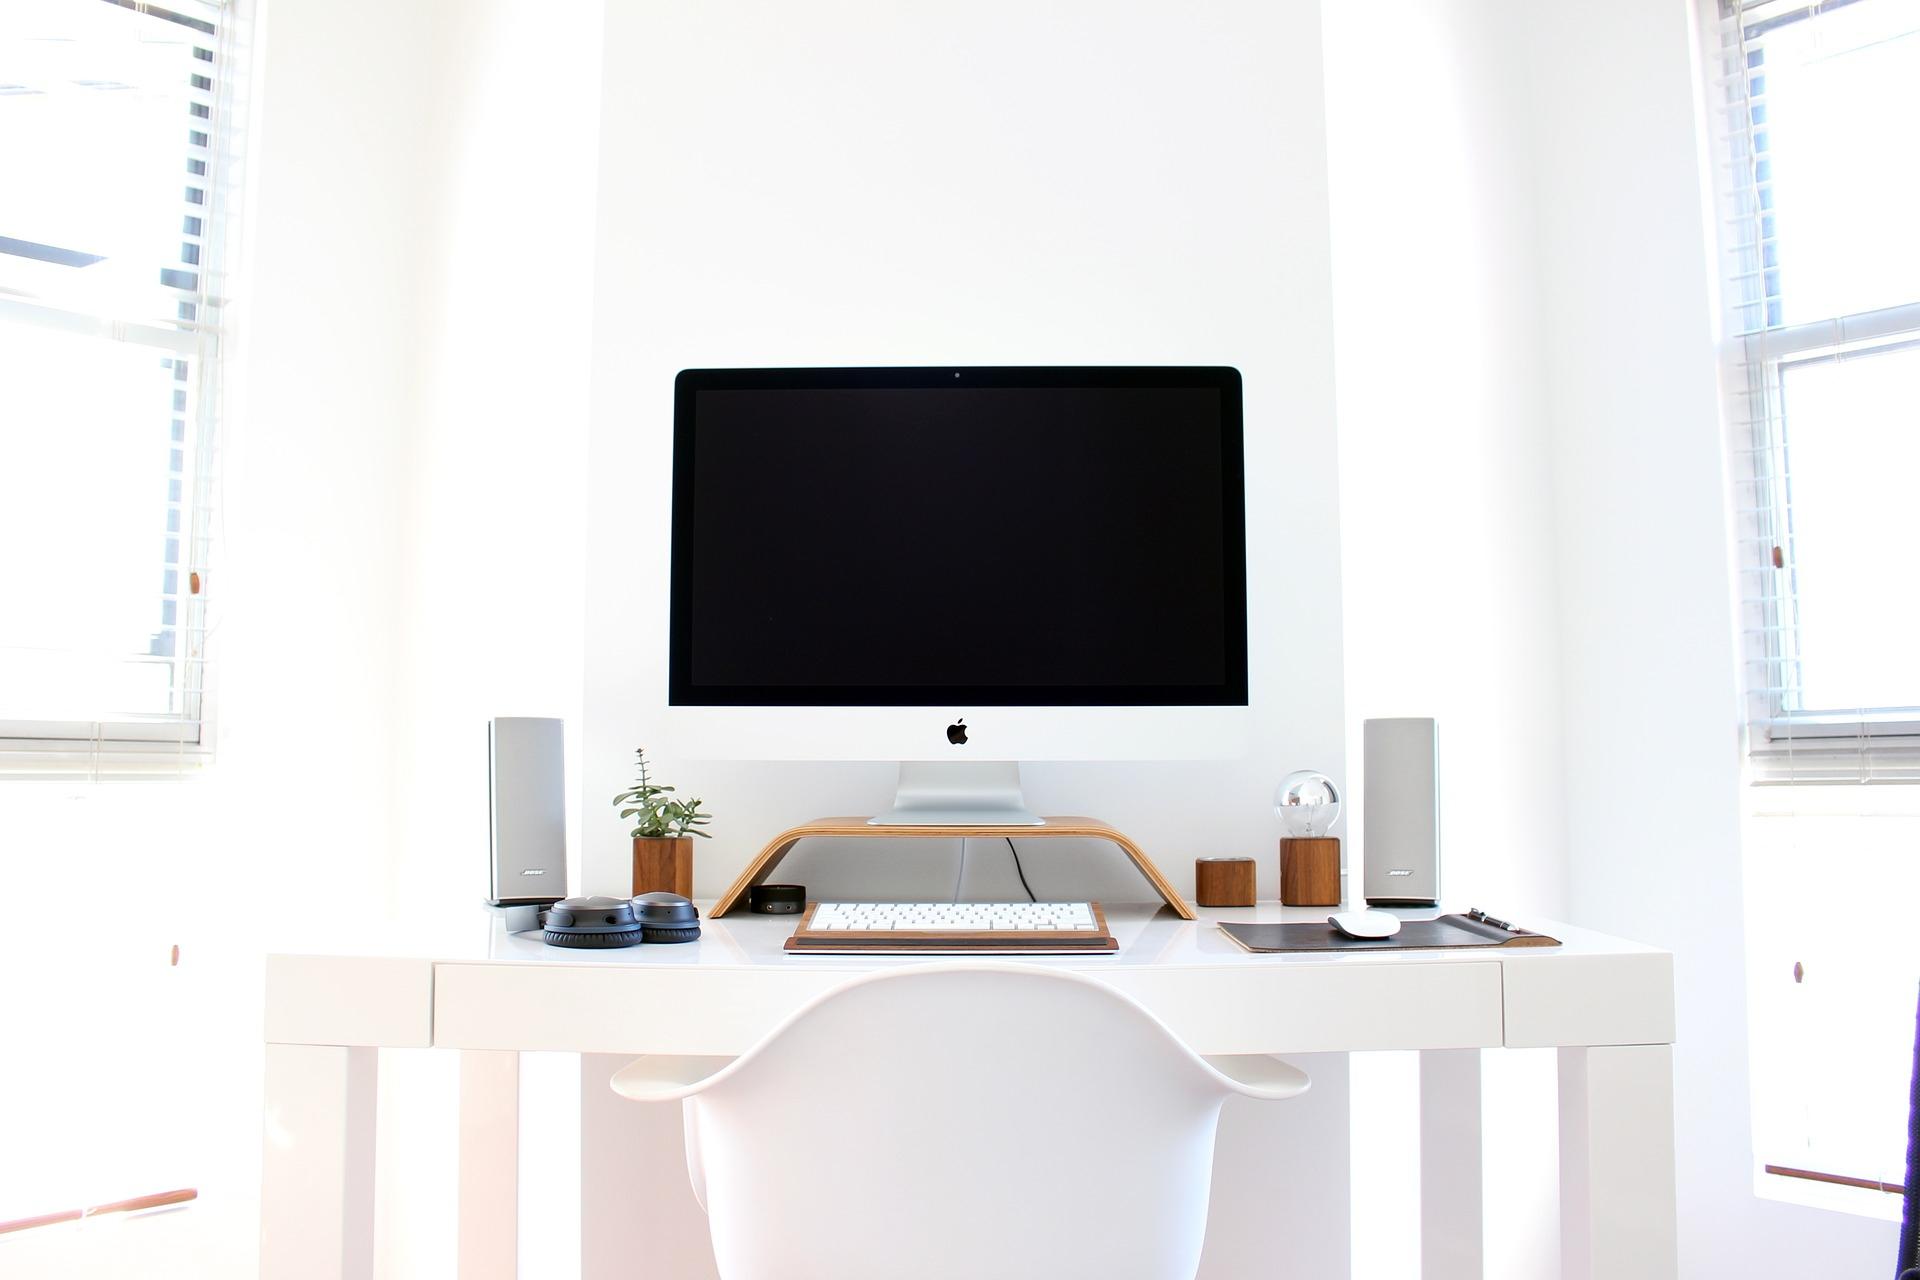 screw_the_average_house_sit_workspace_internet.jpg